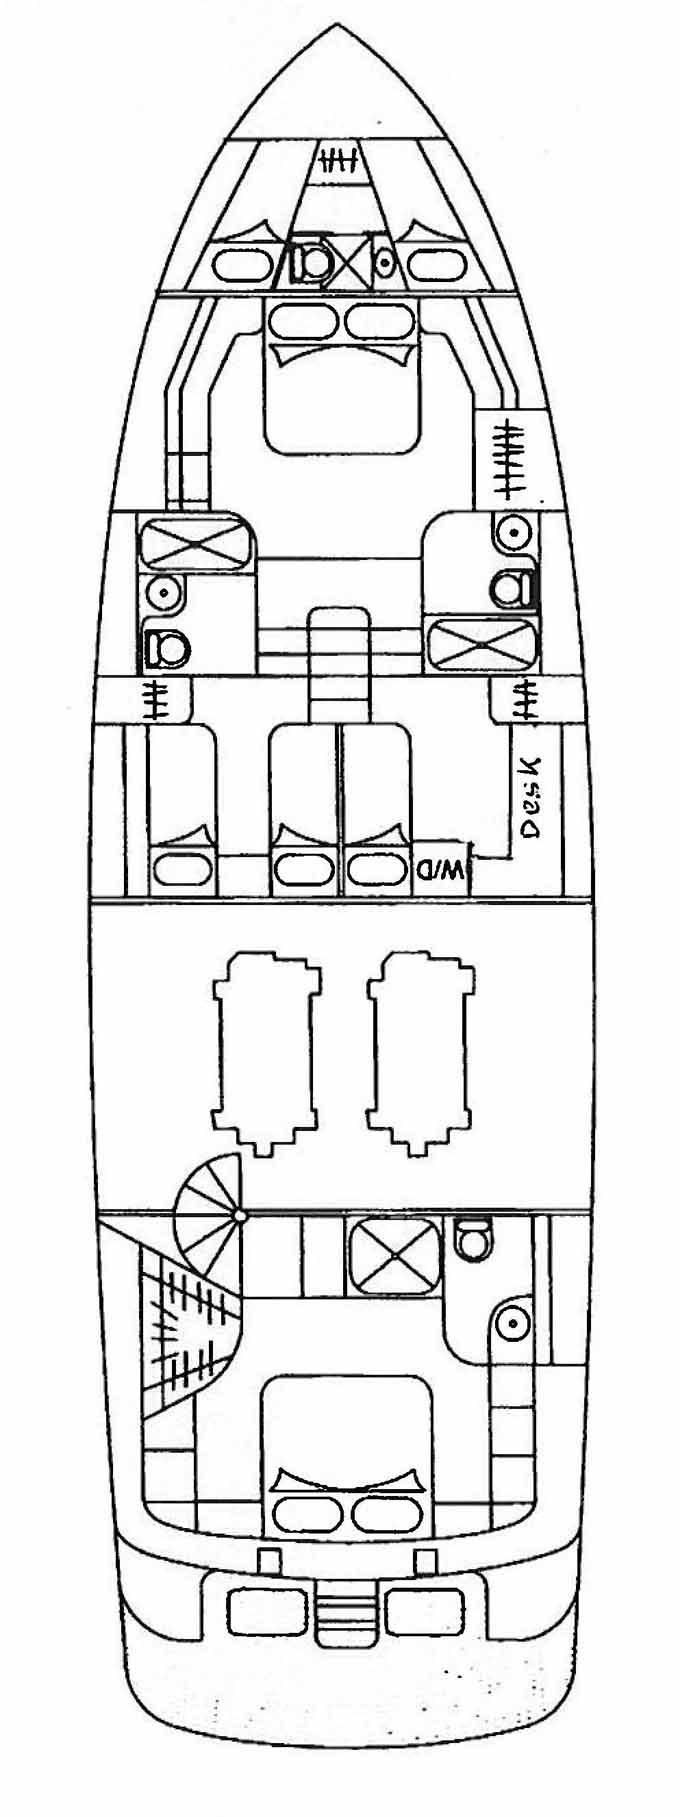 1993 Used Johnson Flybridge Motoryacht W/extension Motor